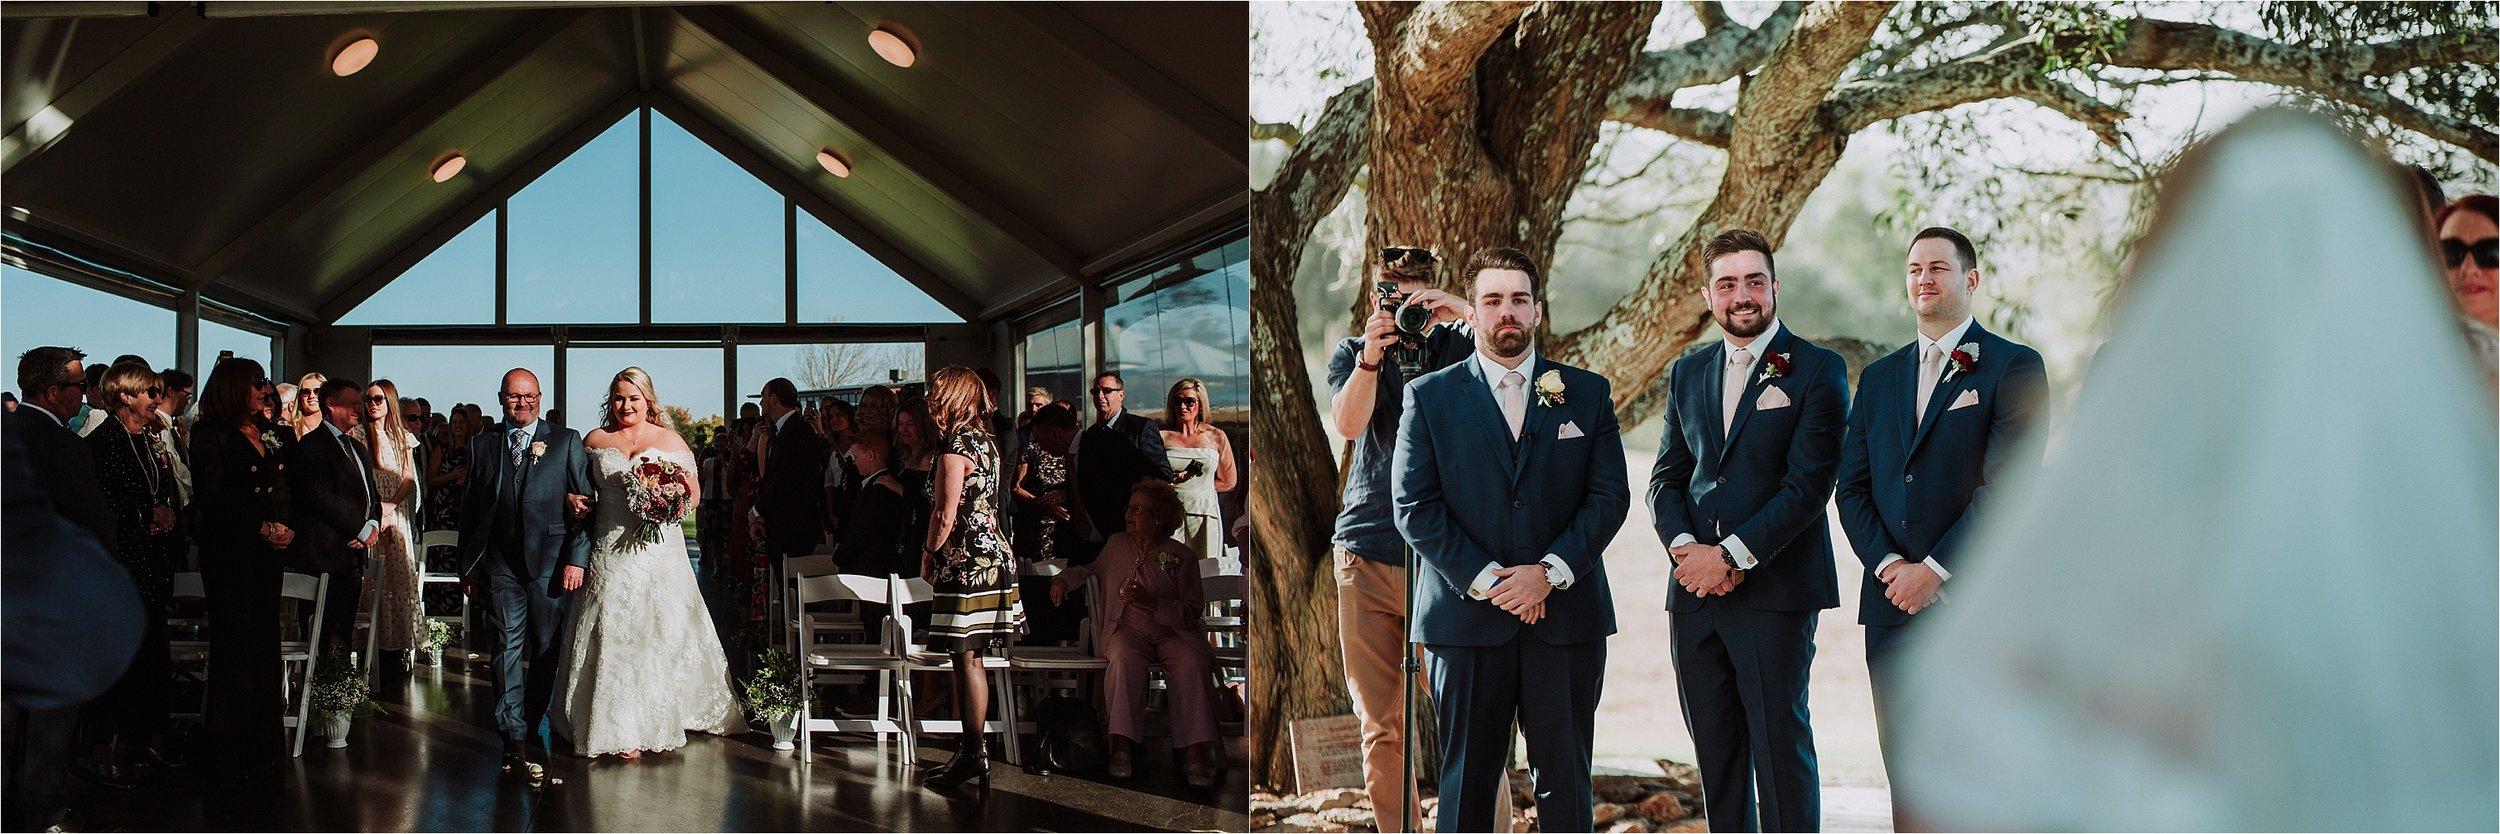 Towoomba - Preston - Peak - Wedding - Gold - Coast - Wedding - Photographers_0035.jpg